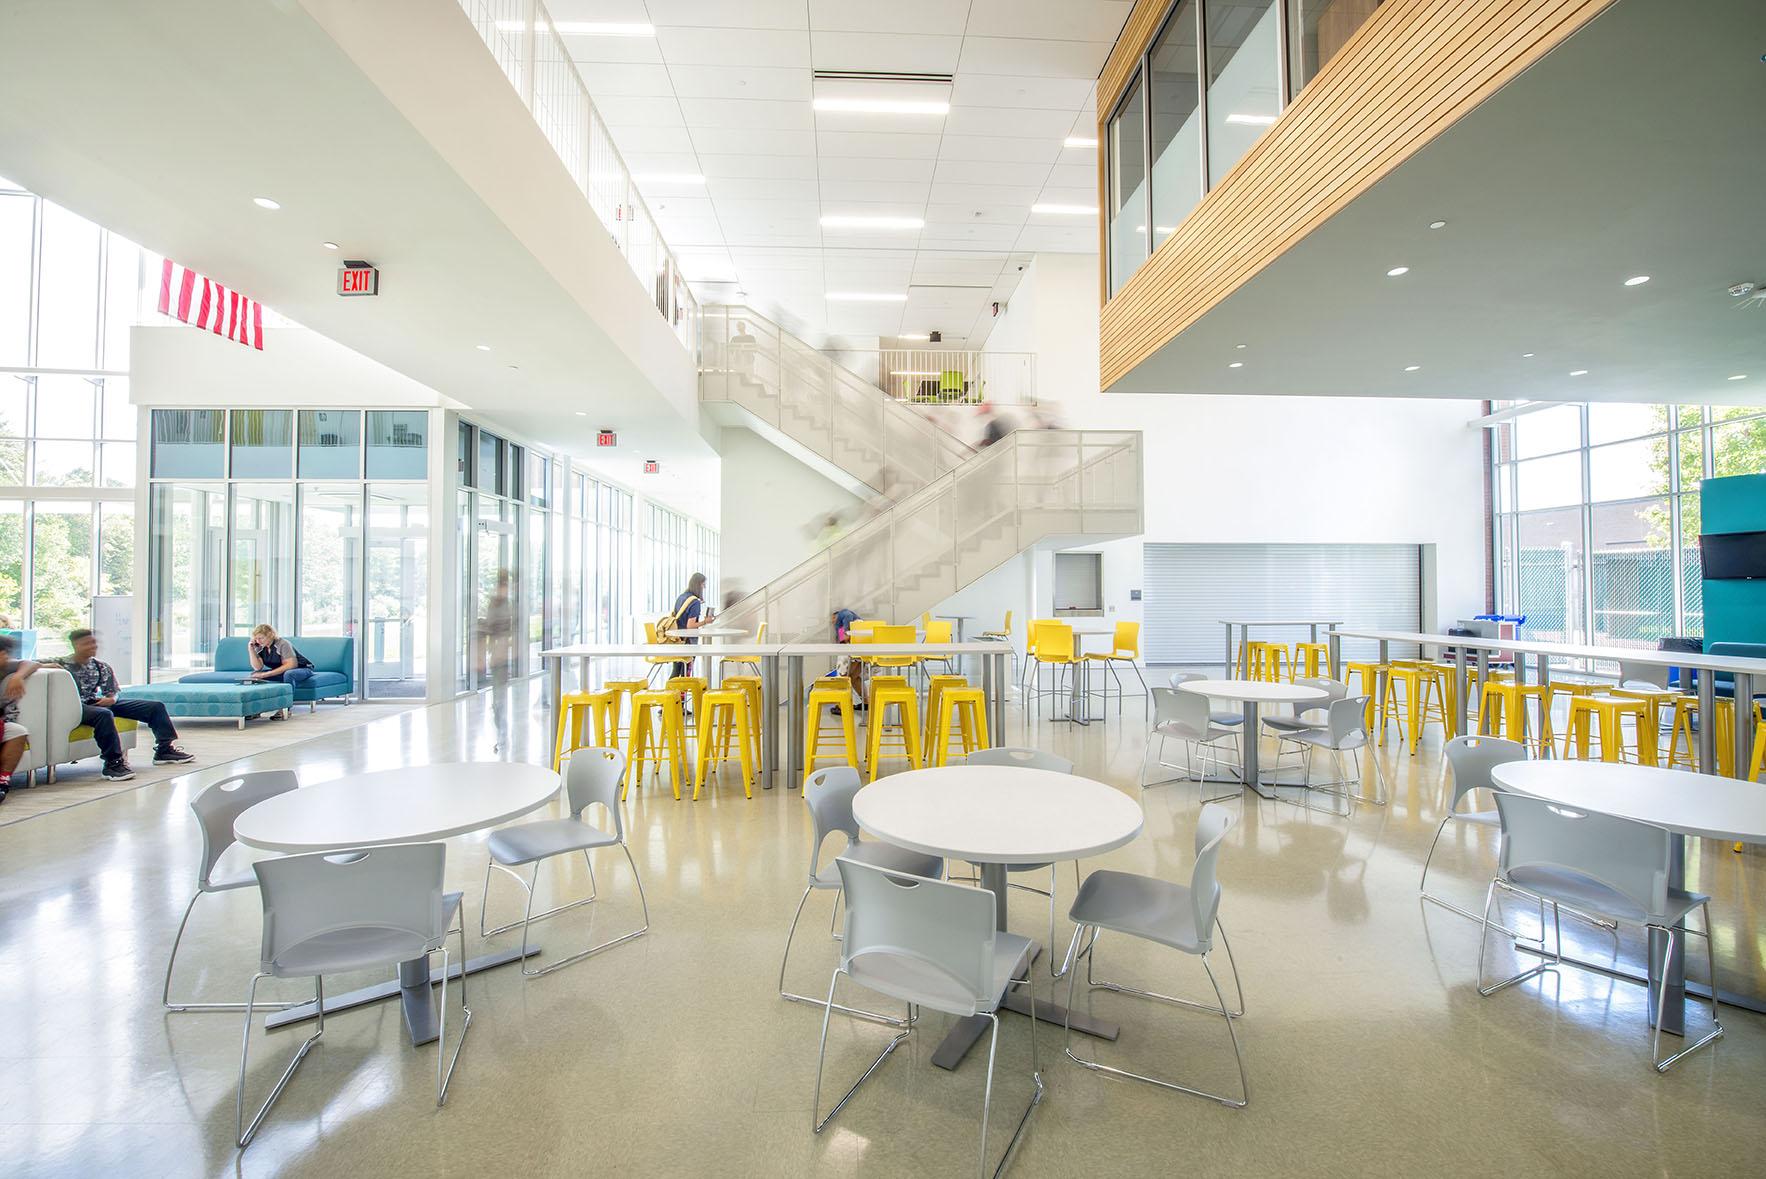 Interior Design Schools In Asheville Nc